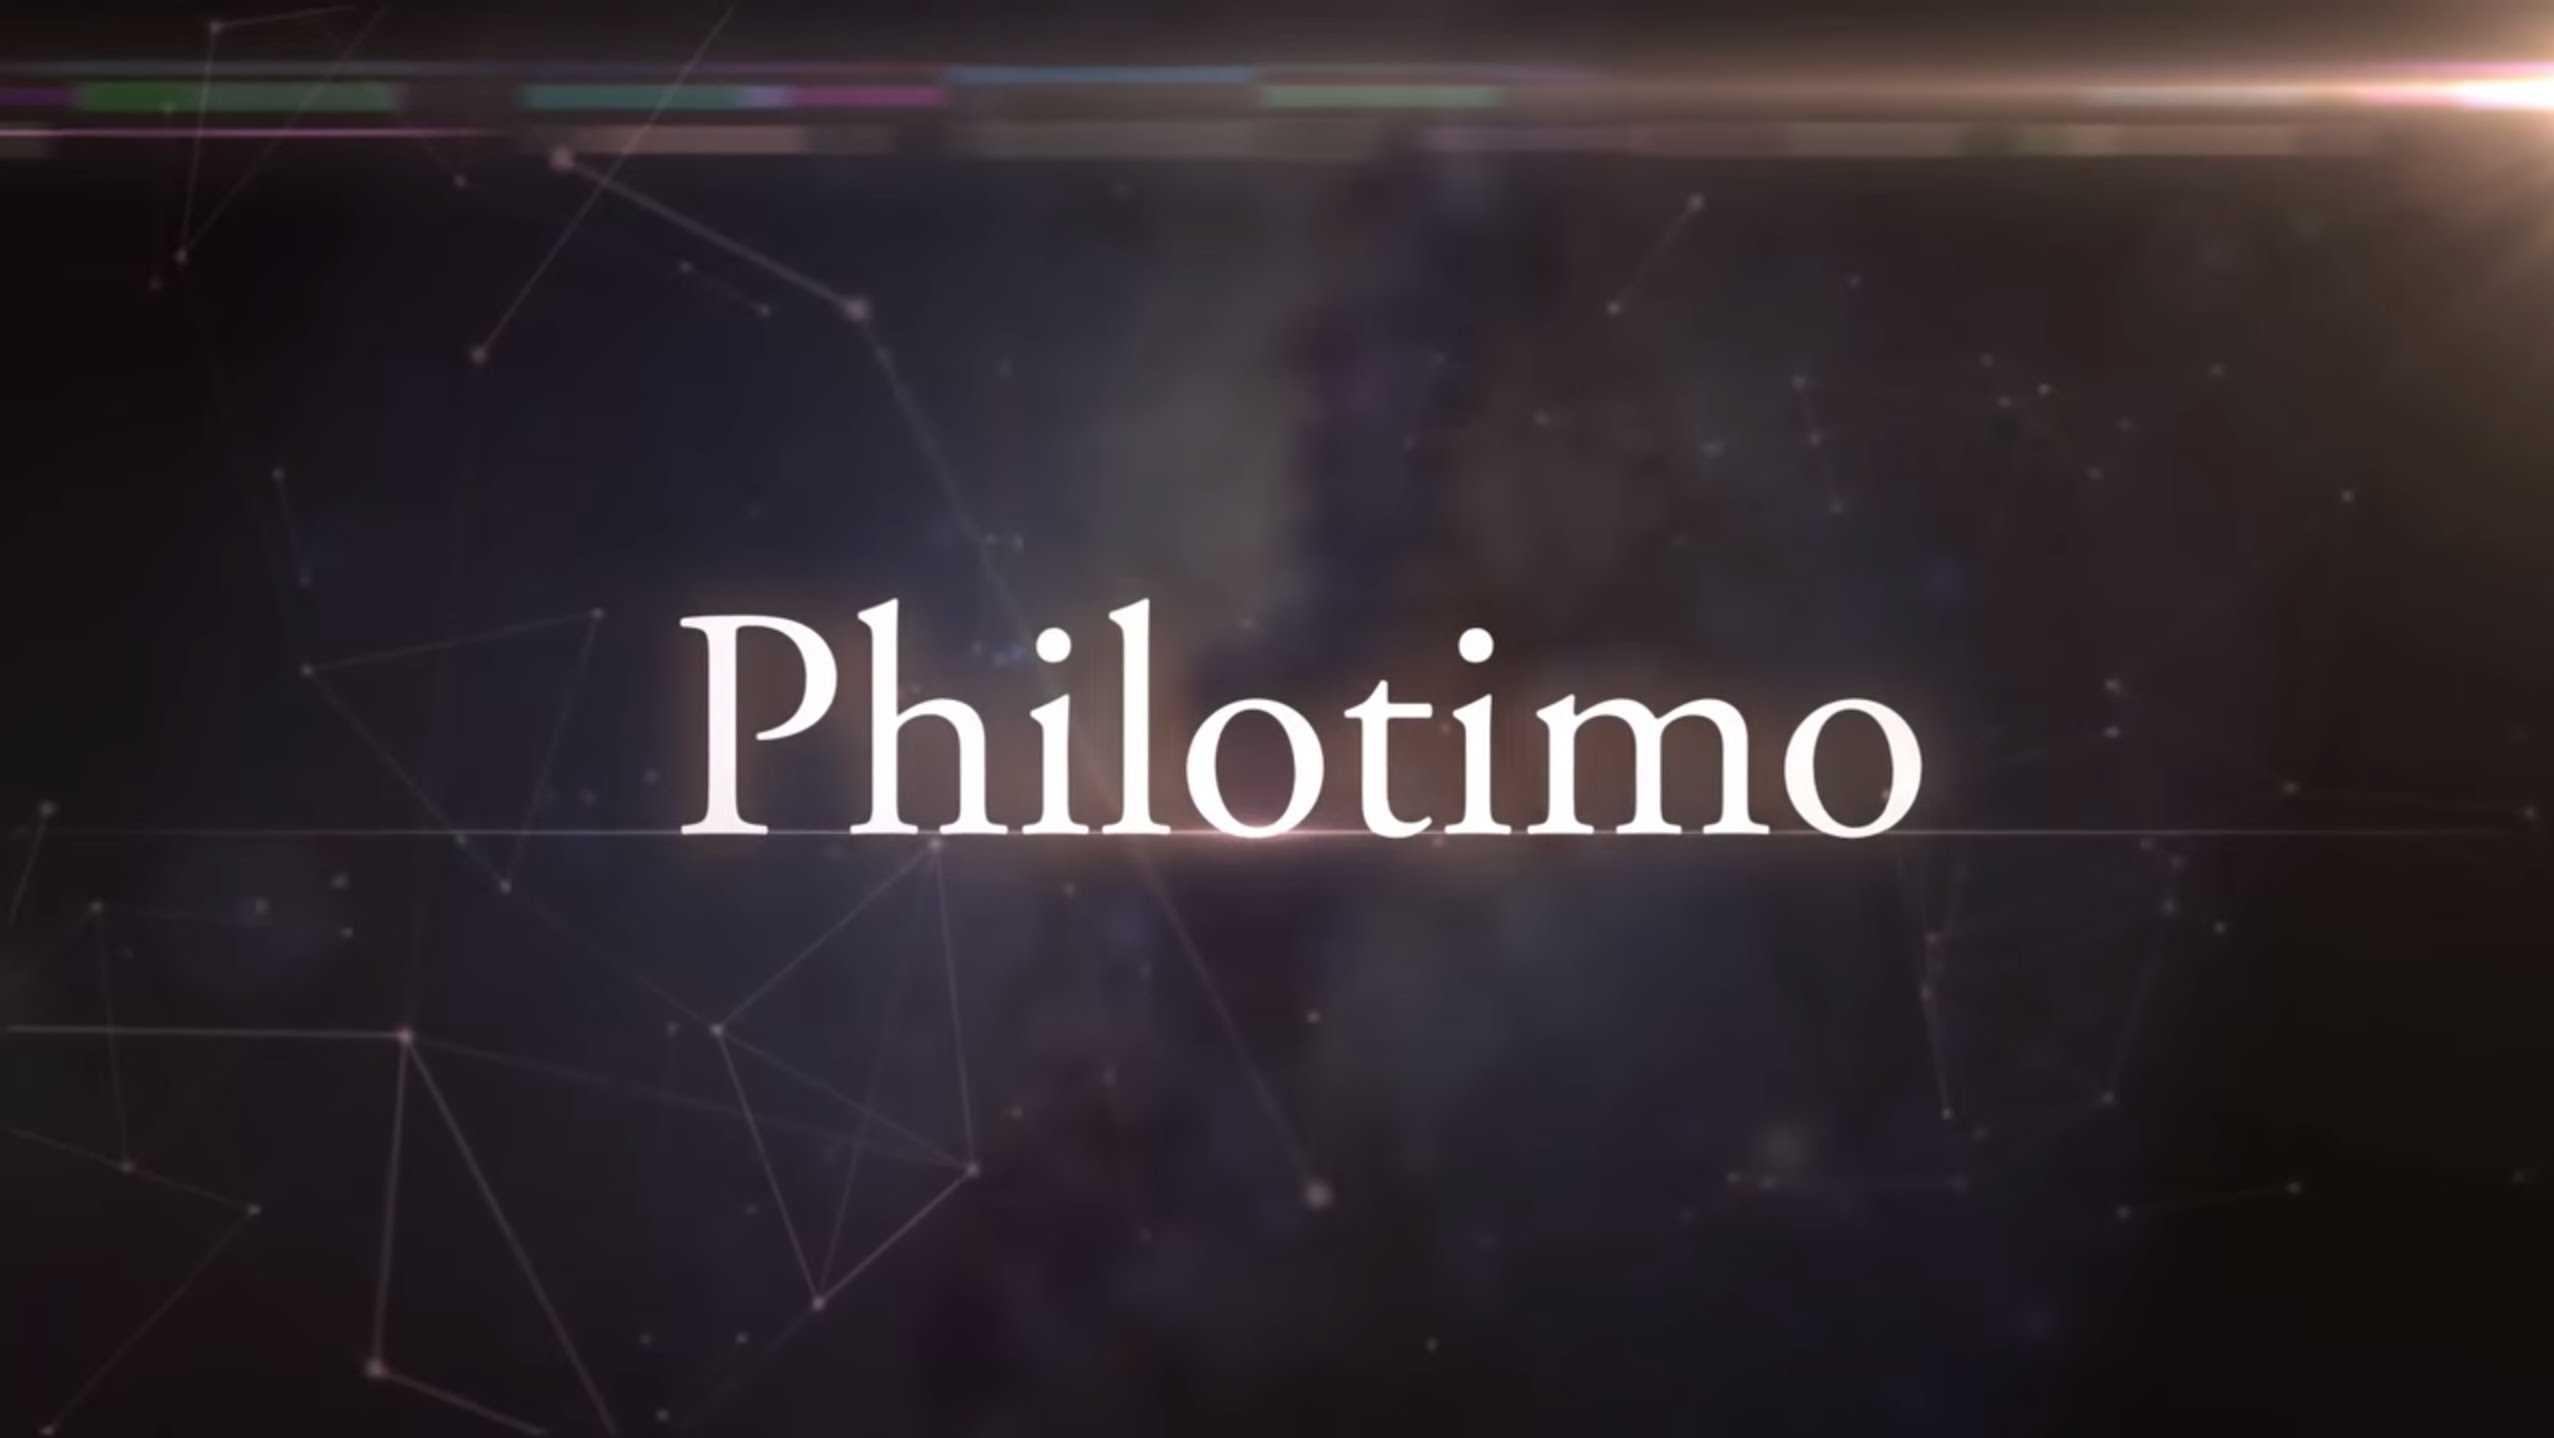 #PHILOTIMO: το δώρο της Ελλάδας στον κόσμο